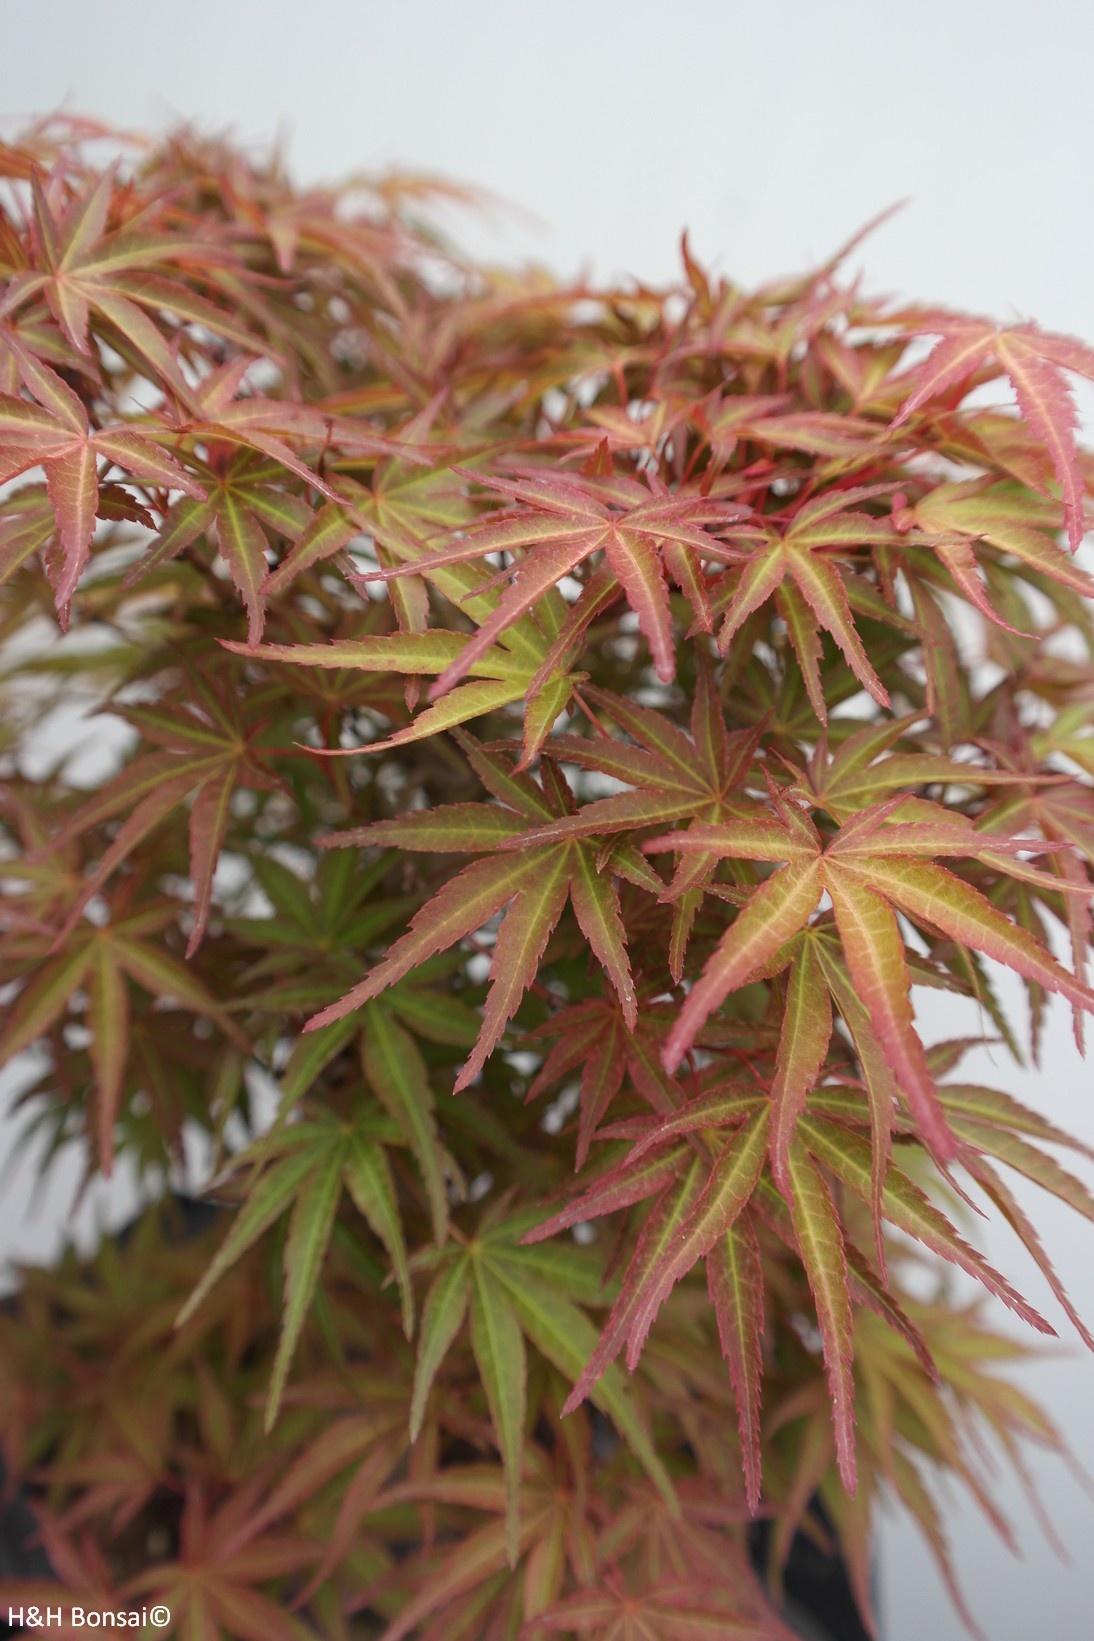 Bonsai Japanese Maple, Acer palmatum, no. 7766